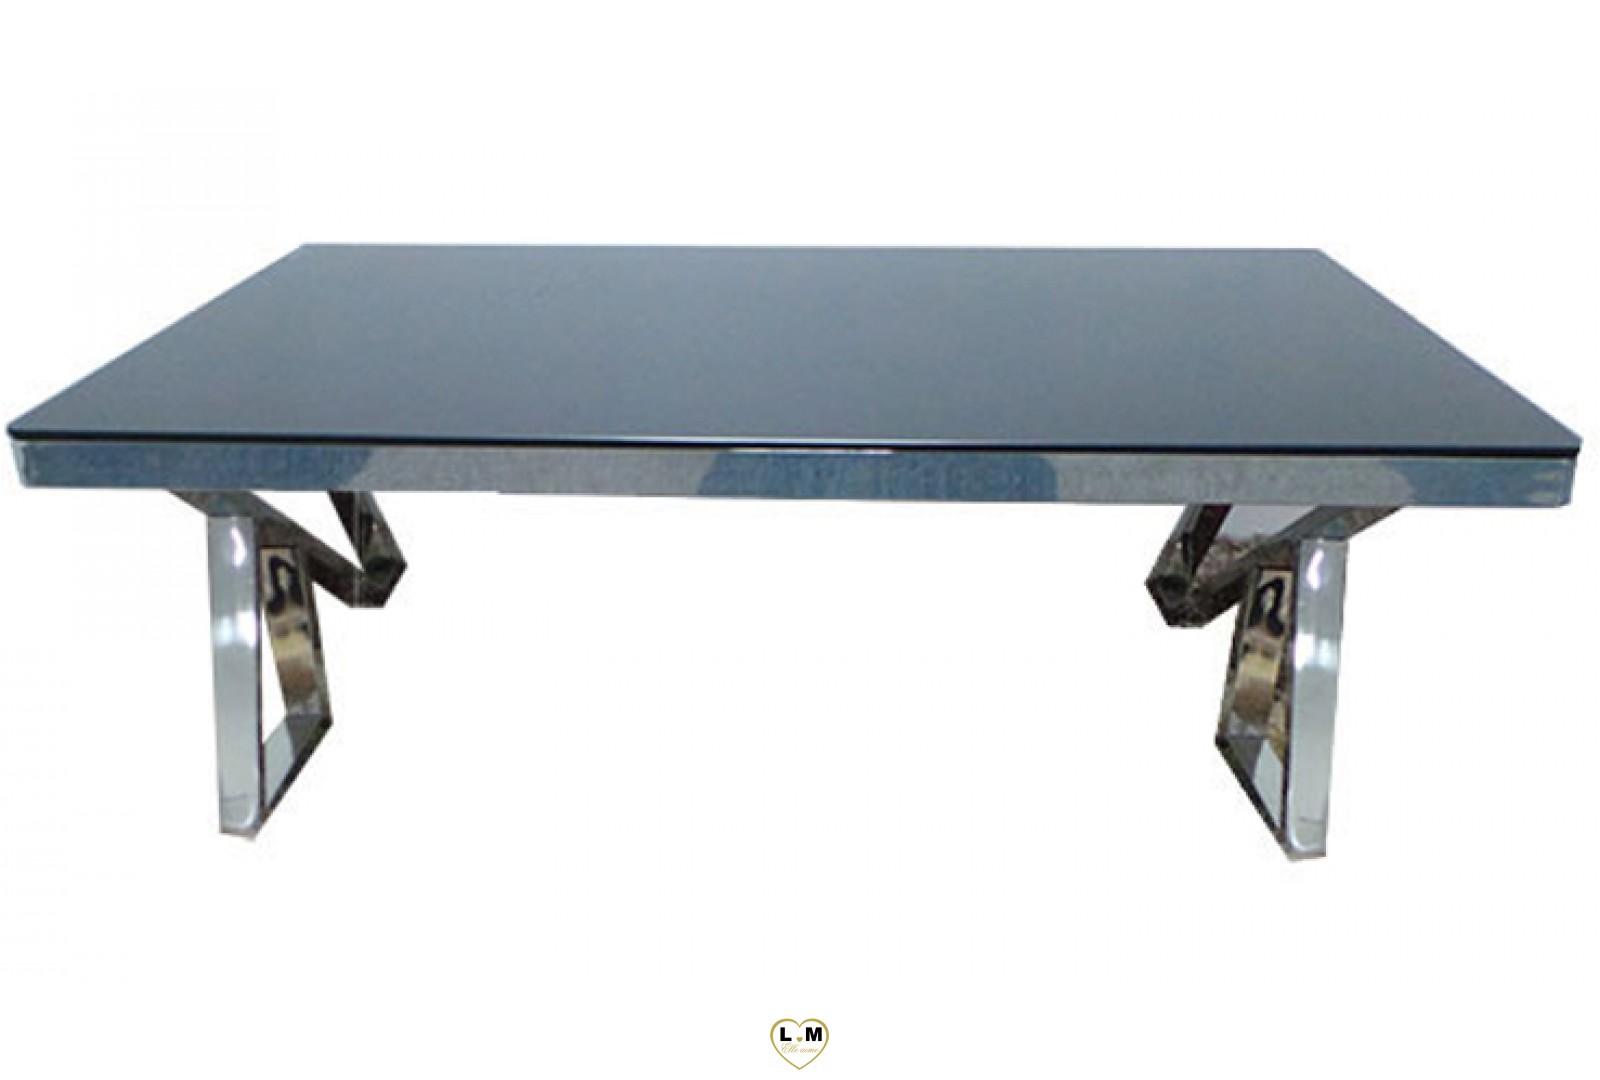 Tbad7 table basse chrome verre noir lignemeuble com - Table basse verre noir ...